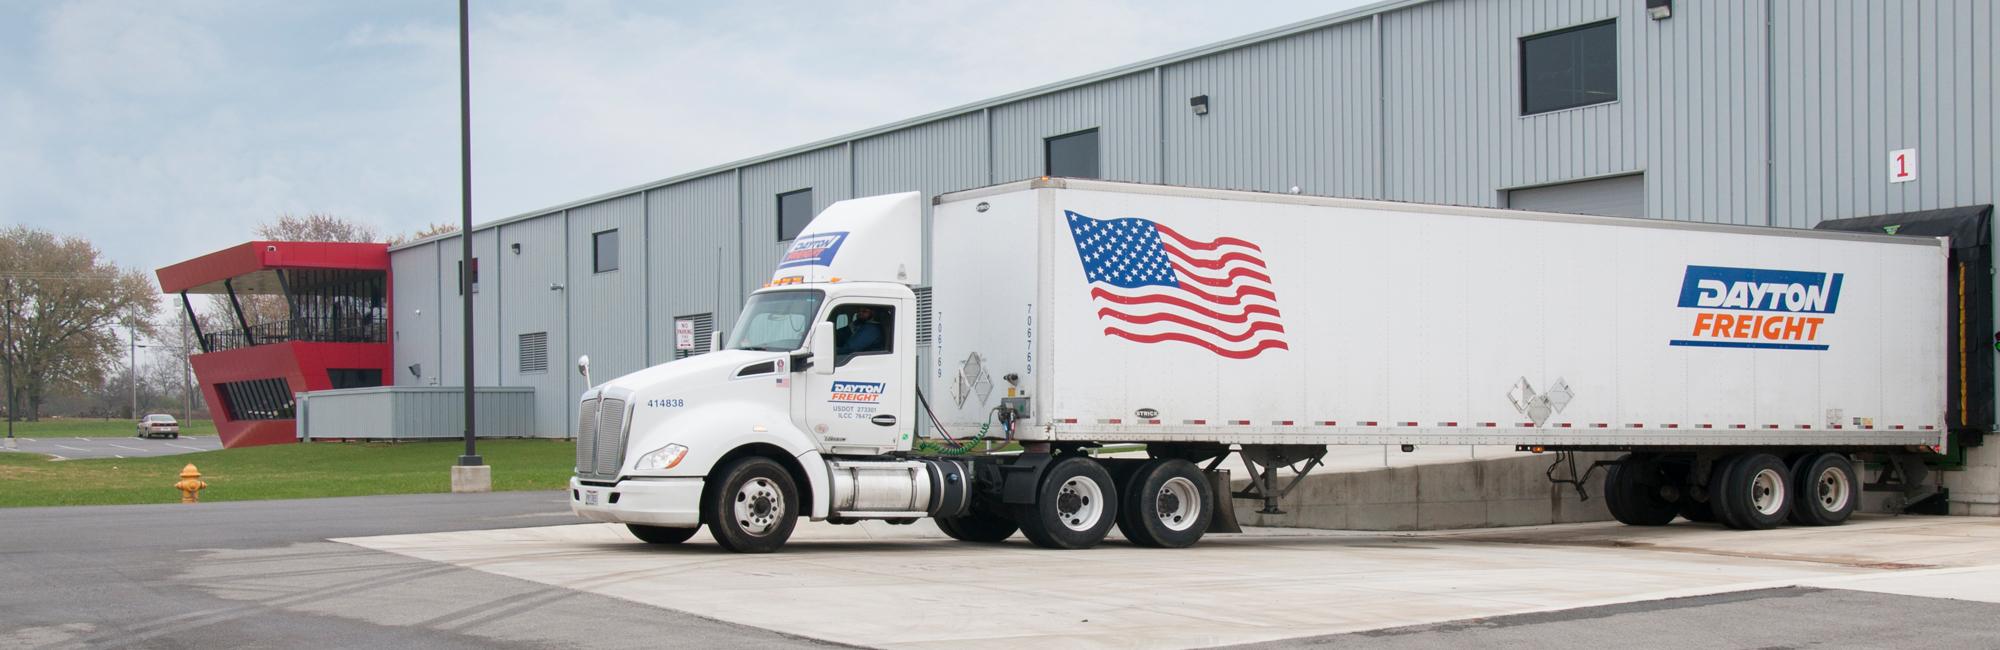 Dayton Freight Named